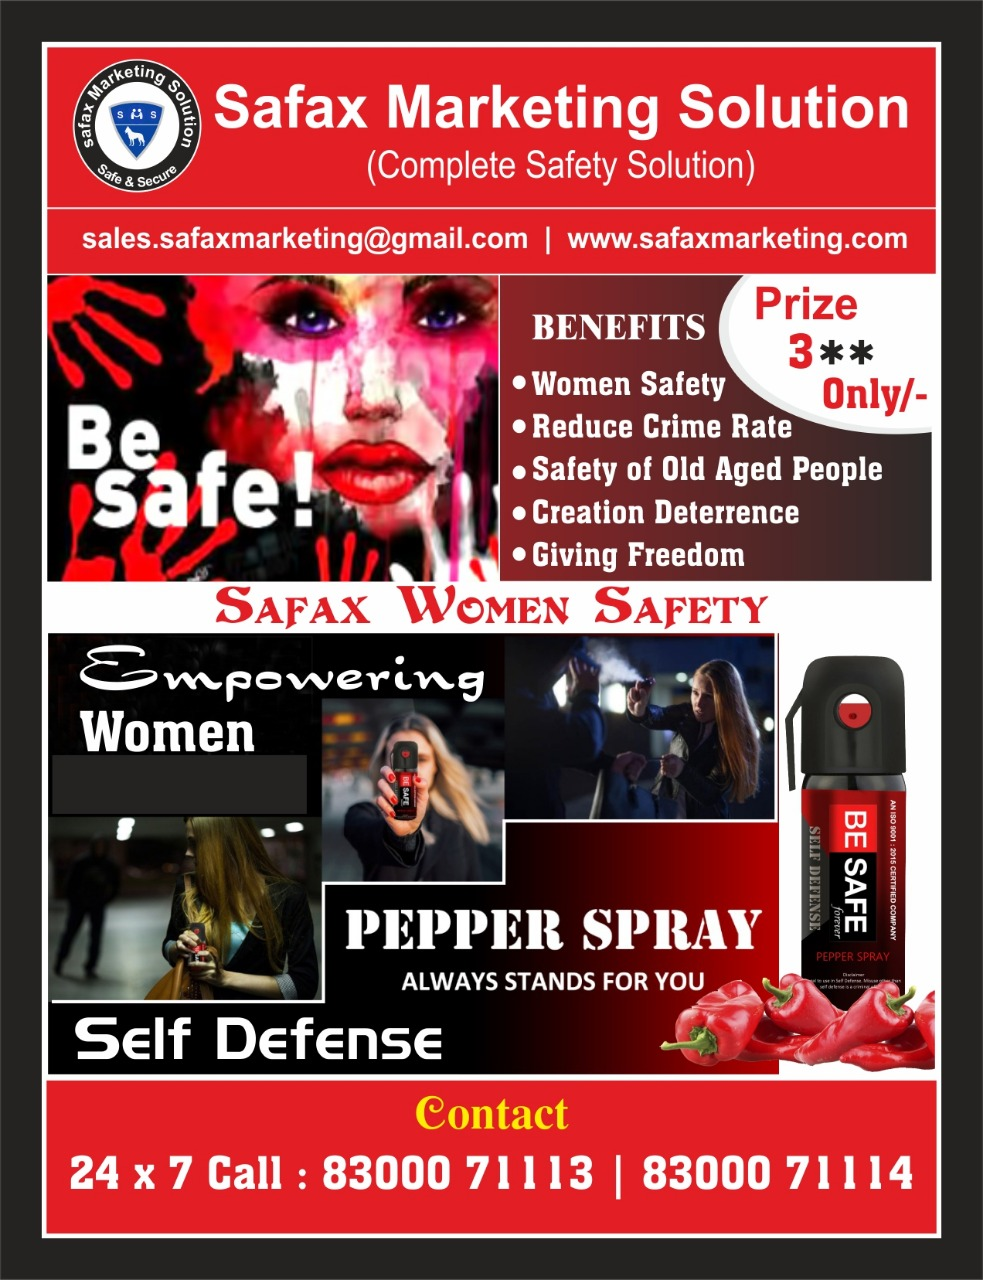 Fire-Fire Safety equipment-fire protection equipment-fire Extinguisher-Fire Alarm- Fire Hydrant-Safepro –Safety first-Safety fire-ravels-agni-smoke detector-heat detector-Abc powder-foam-water-fire panel-be safe pepper spray-home automation-two wheeler tracking device-fire pump-hydrant point-fire service-Dealer-Manufacture-Wholesaler-Dealers-in-Madurai-Thanjavur-Dindingul-Erode-Salem-Pollachi- Gobi- Sathyamangalam- Mettupalayam- Tiruppur- Palladam- Udumalai- Mettur- Palani- Valparai- Kangeyam- Dharapuram- Rasipuram- Erode- Bhavani- Salem- Ooty- Kodaikanal- Karur- Dindigul- Thanjavur- Tiruvarur- Madurai- Tirunelveli- Vellore- Kanyakumari- Nagercoil- Cuddalore- Kanchipuram- Tiruvannamalai- Kumbakonam- Rajapalayam- Virudunagar- Pudukottai- Hosur- Krishnagiri- Ambur- Karaikkudi- Neyveli- Viluppuram- Virudhunagar- Sivagangai- Nagapattinam- Pondicherry- Karaikal- Chidambaram- Dharmapuri- Palakkad-tamilnadu.